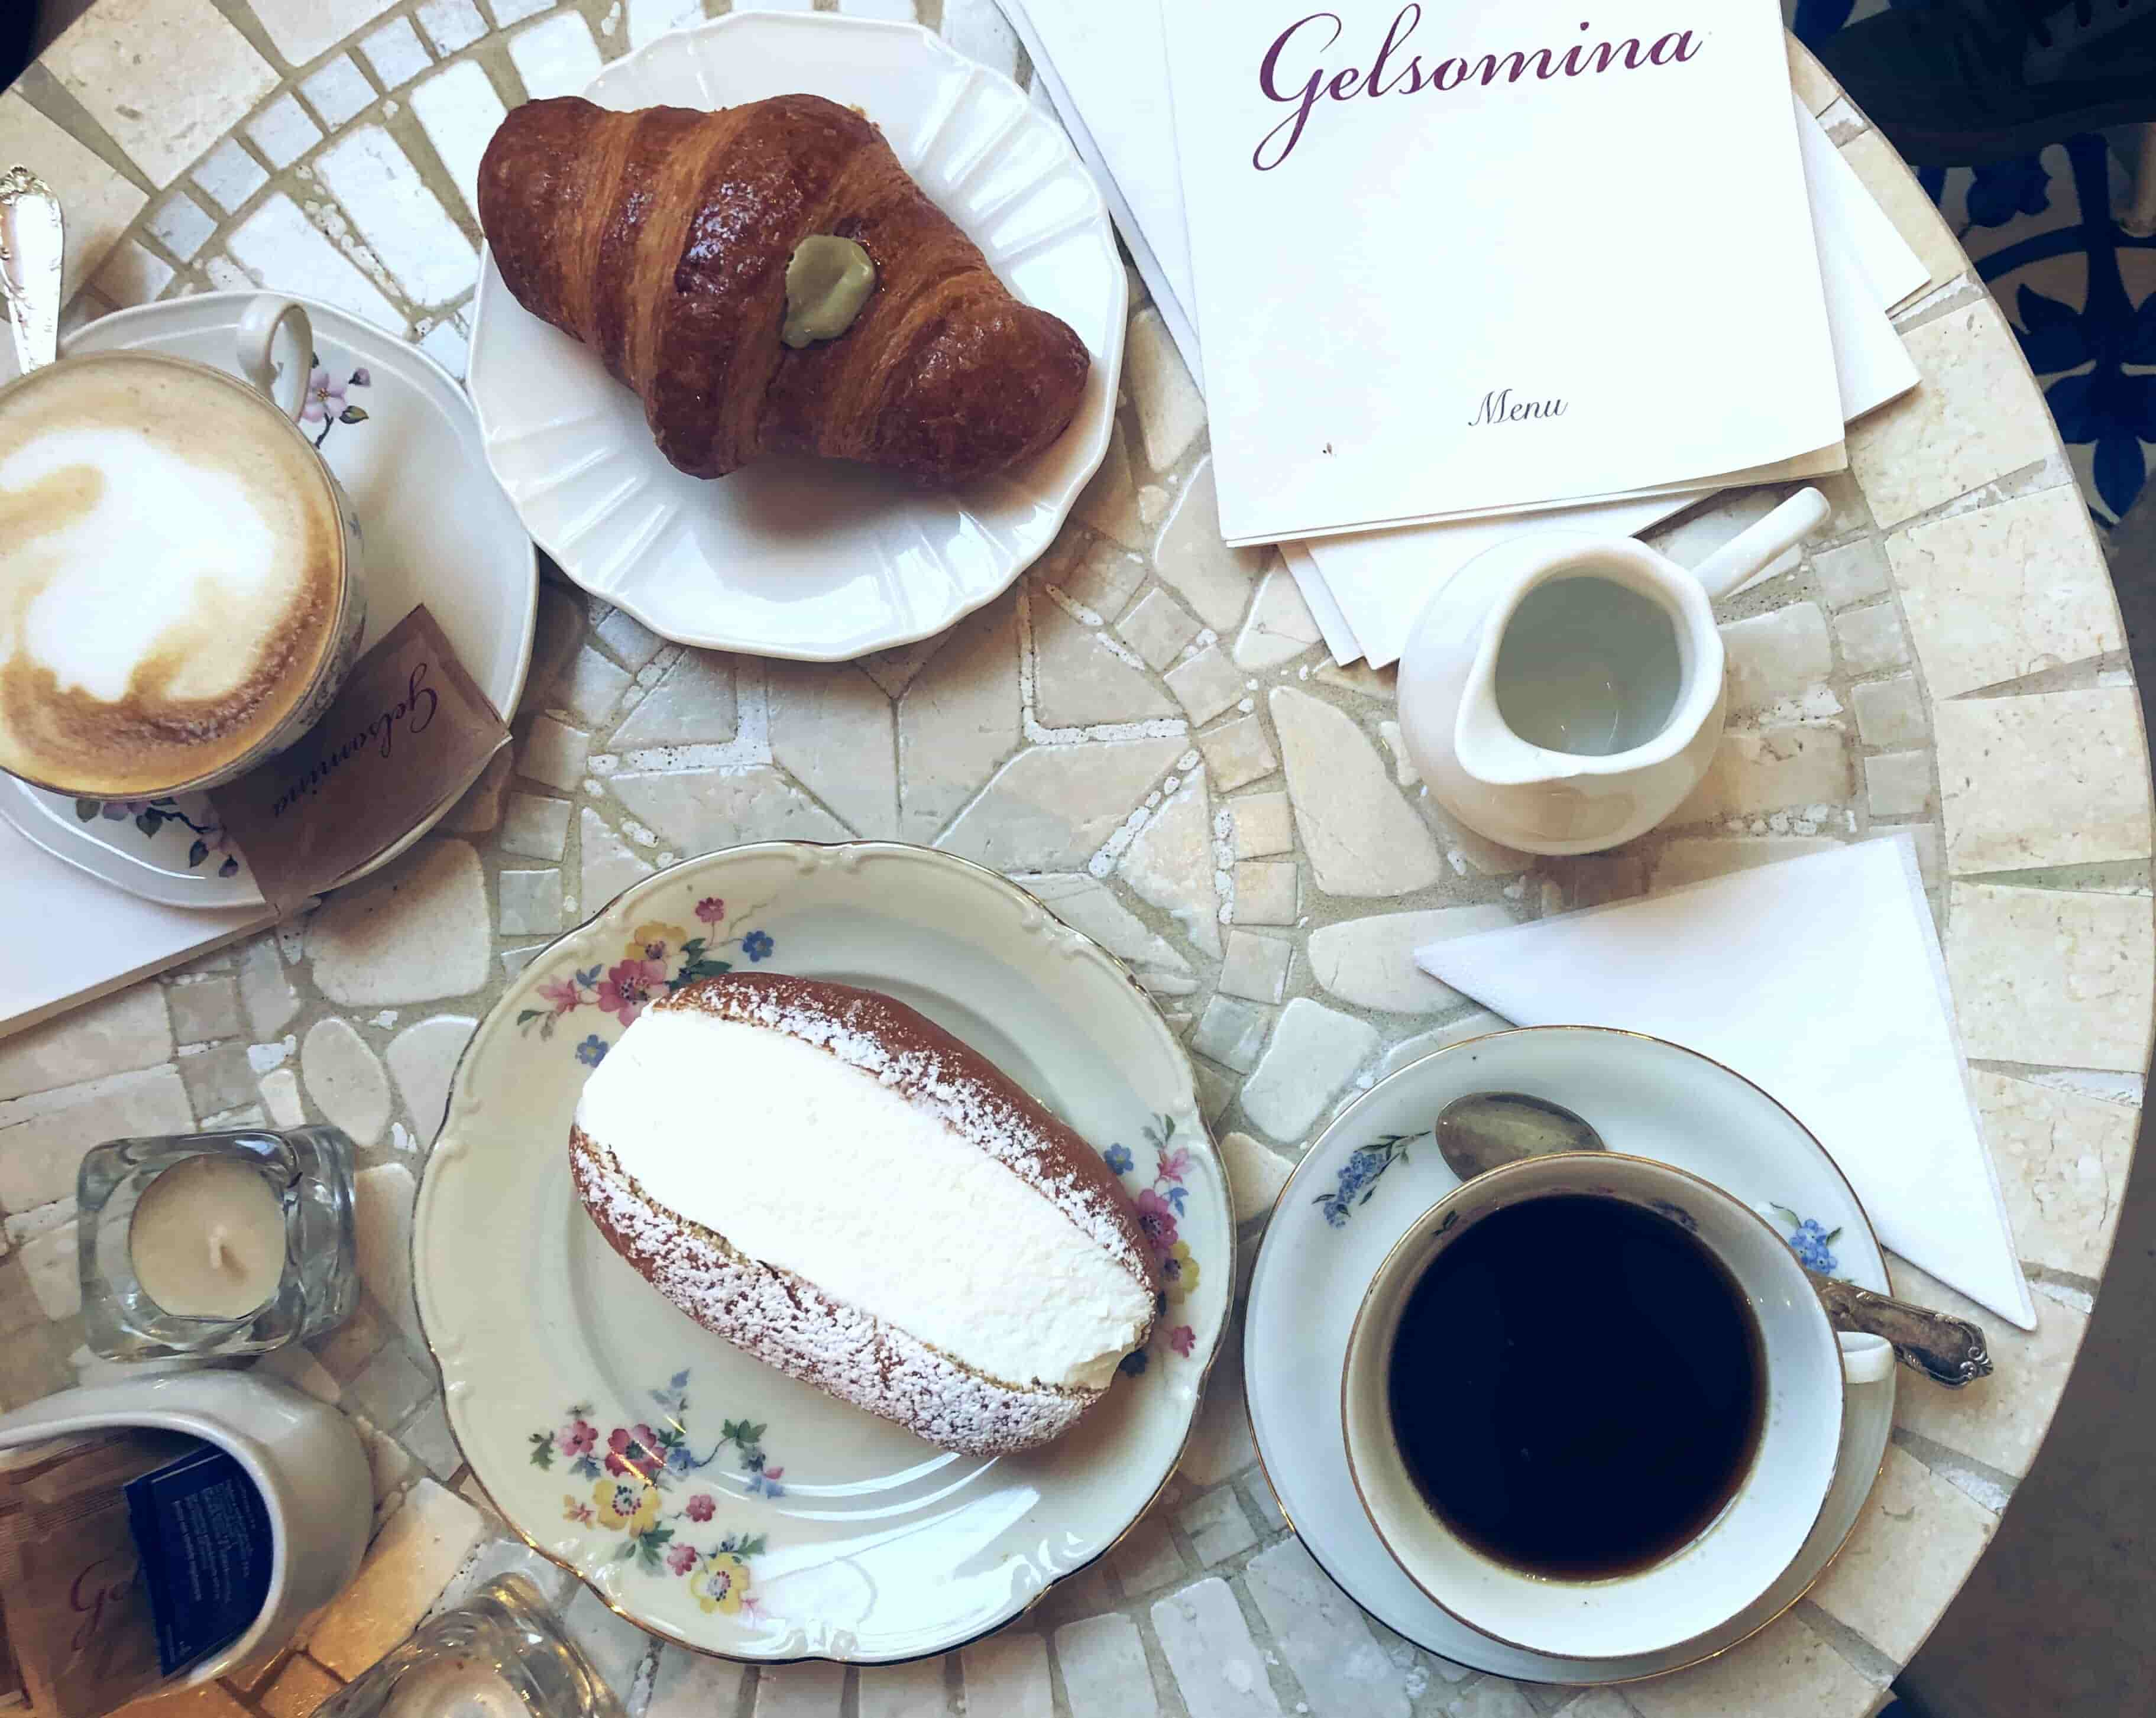 Gelsomina Milano